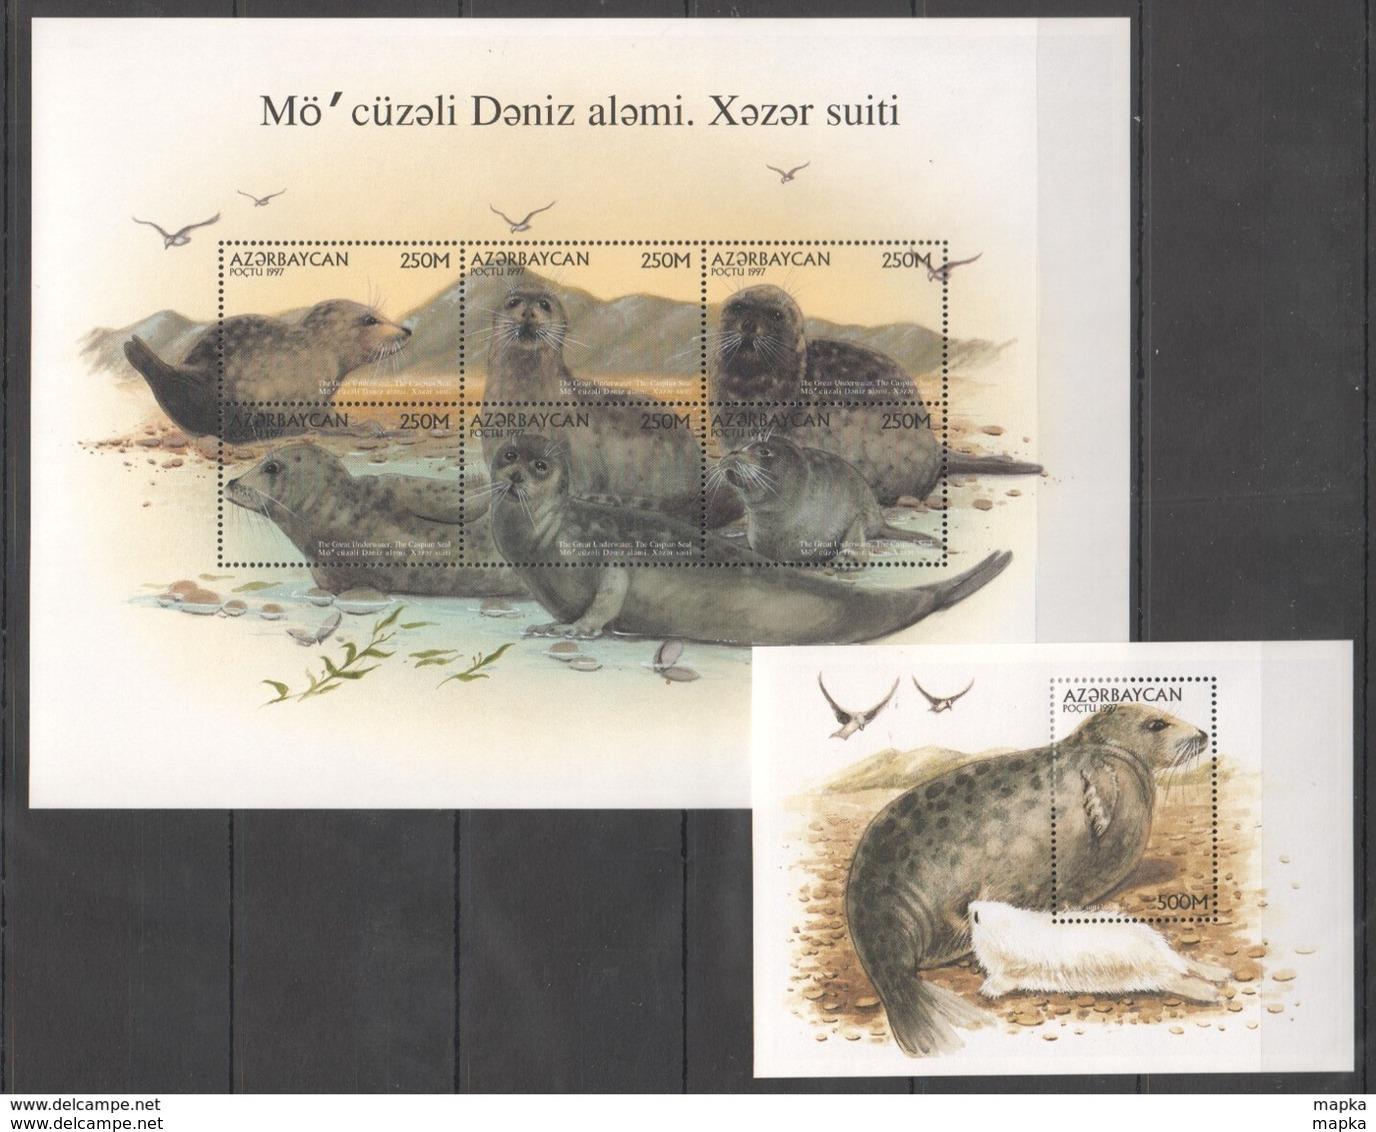 PK056 1997 AZERBAYCAN ANIMALS MARINE MAMMALS 1KB+1BL MNH STAMPS - Vita Acquatica